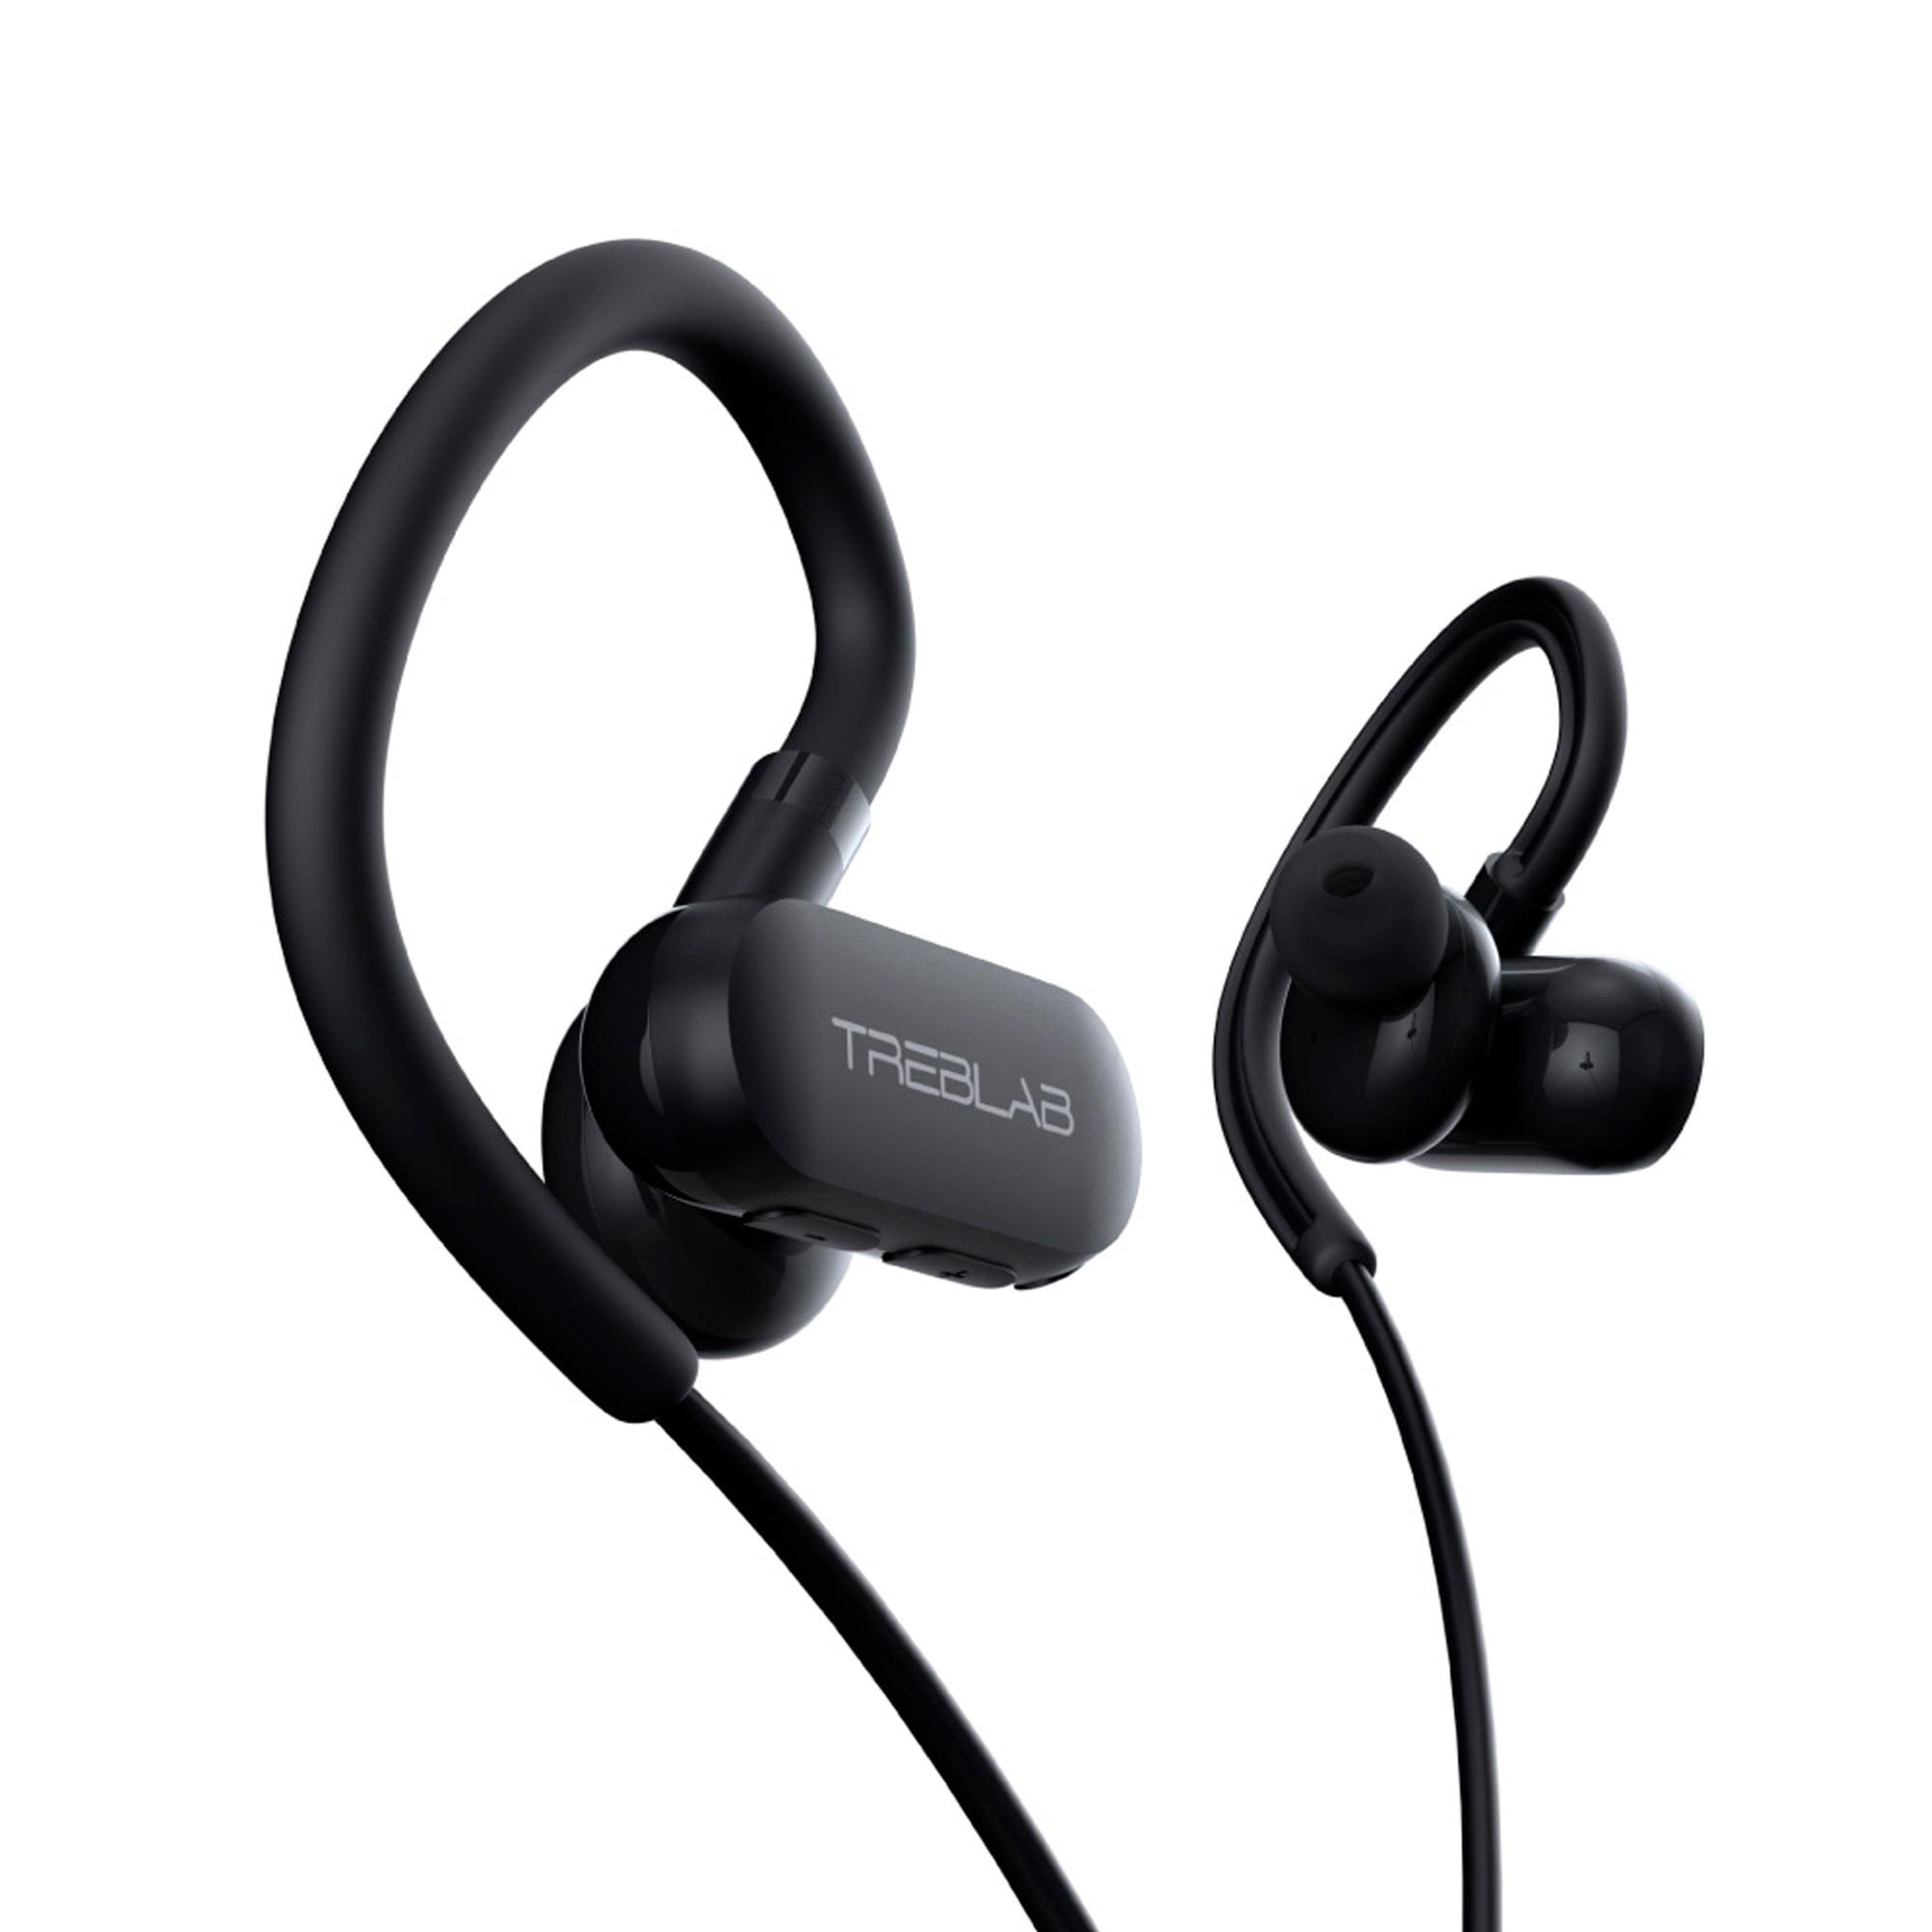 f127e625b98 TREBLAB xRun - Sports Wireless Earbuds for Running, Light Workout  Headphones Bluetooth 5.0, IPX4 Waterproof Sweatproof Gym Earphones, Noise  Cancelling ...